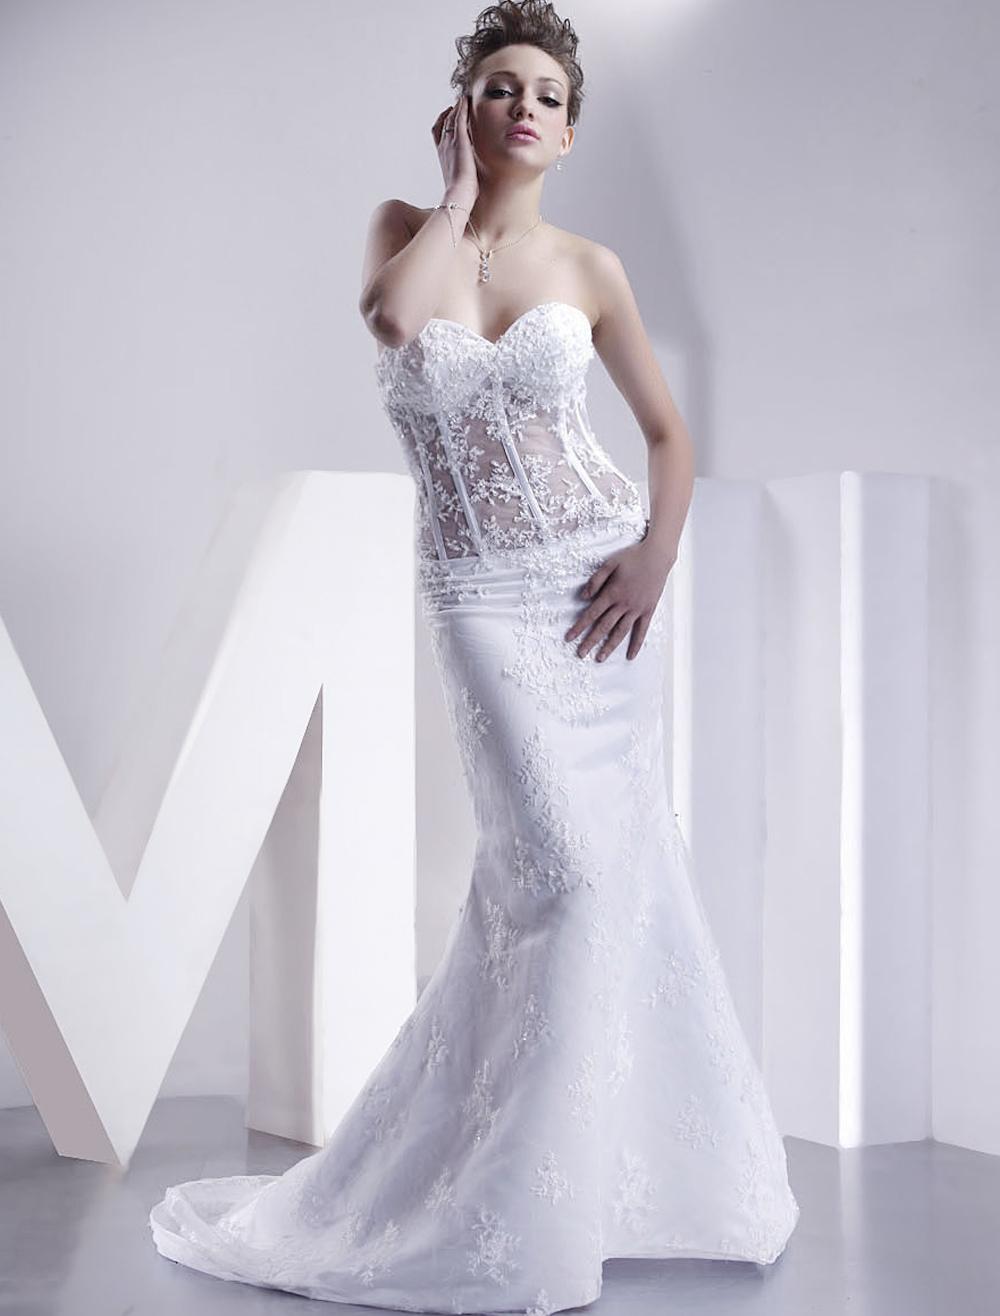 White Wedding Dresses Strapless Mermaid Bridal Dress Lace Applique Sweetheart Neckline Boned Illusion Train Wedding Gown